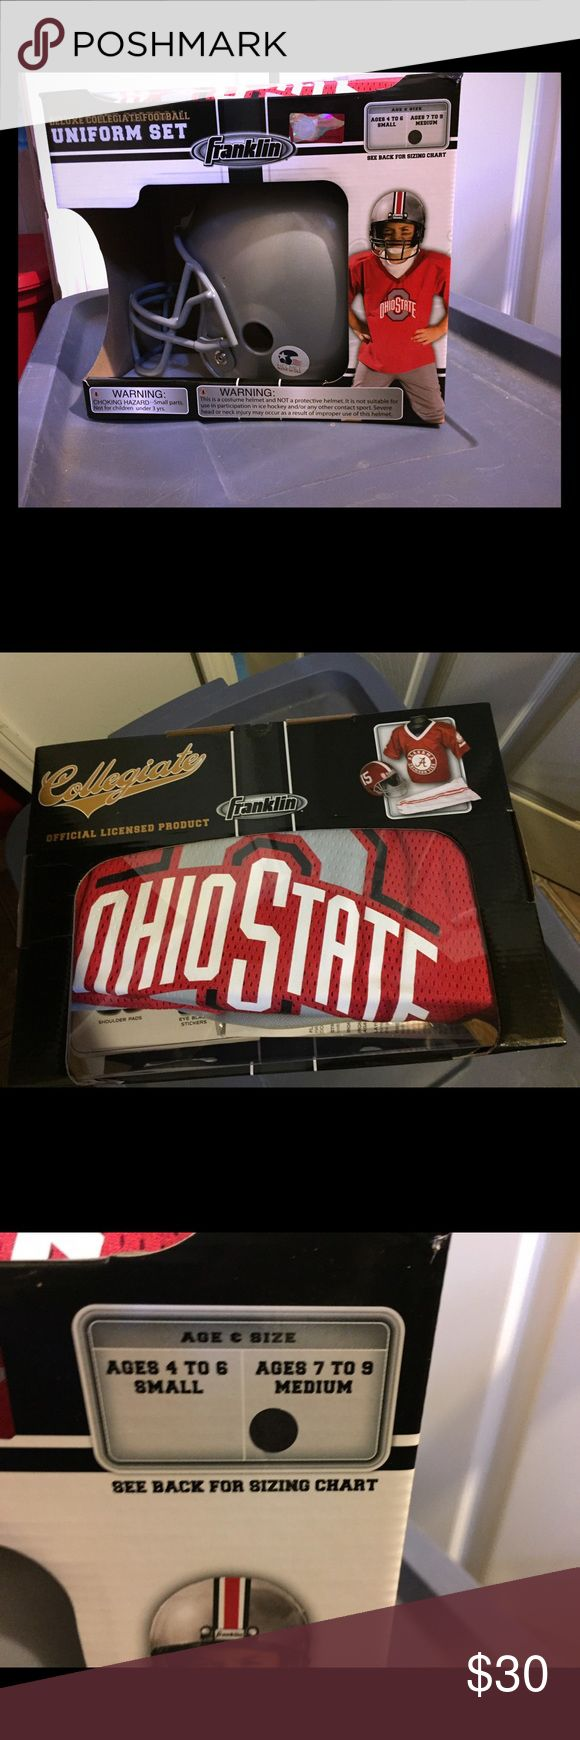 Boys Ohio State football uniform Boys Ohio State University football uniform, new never opened. Includes helmet, jersey, and football pants, size 6/7 M Costumes Seasonal